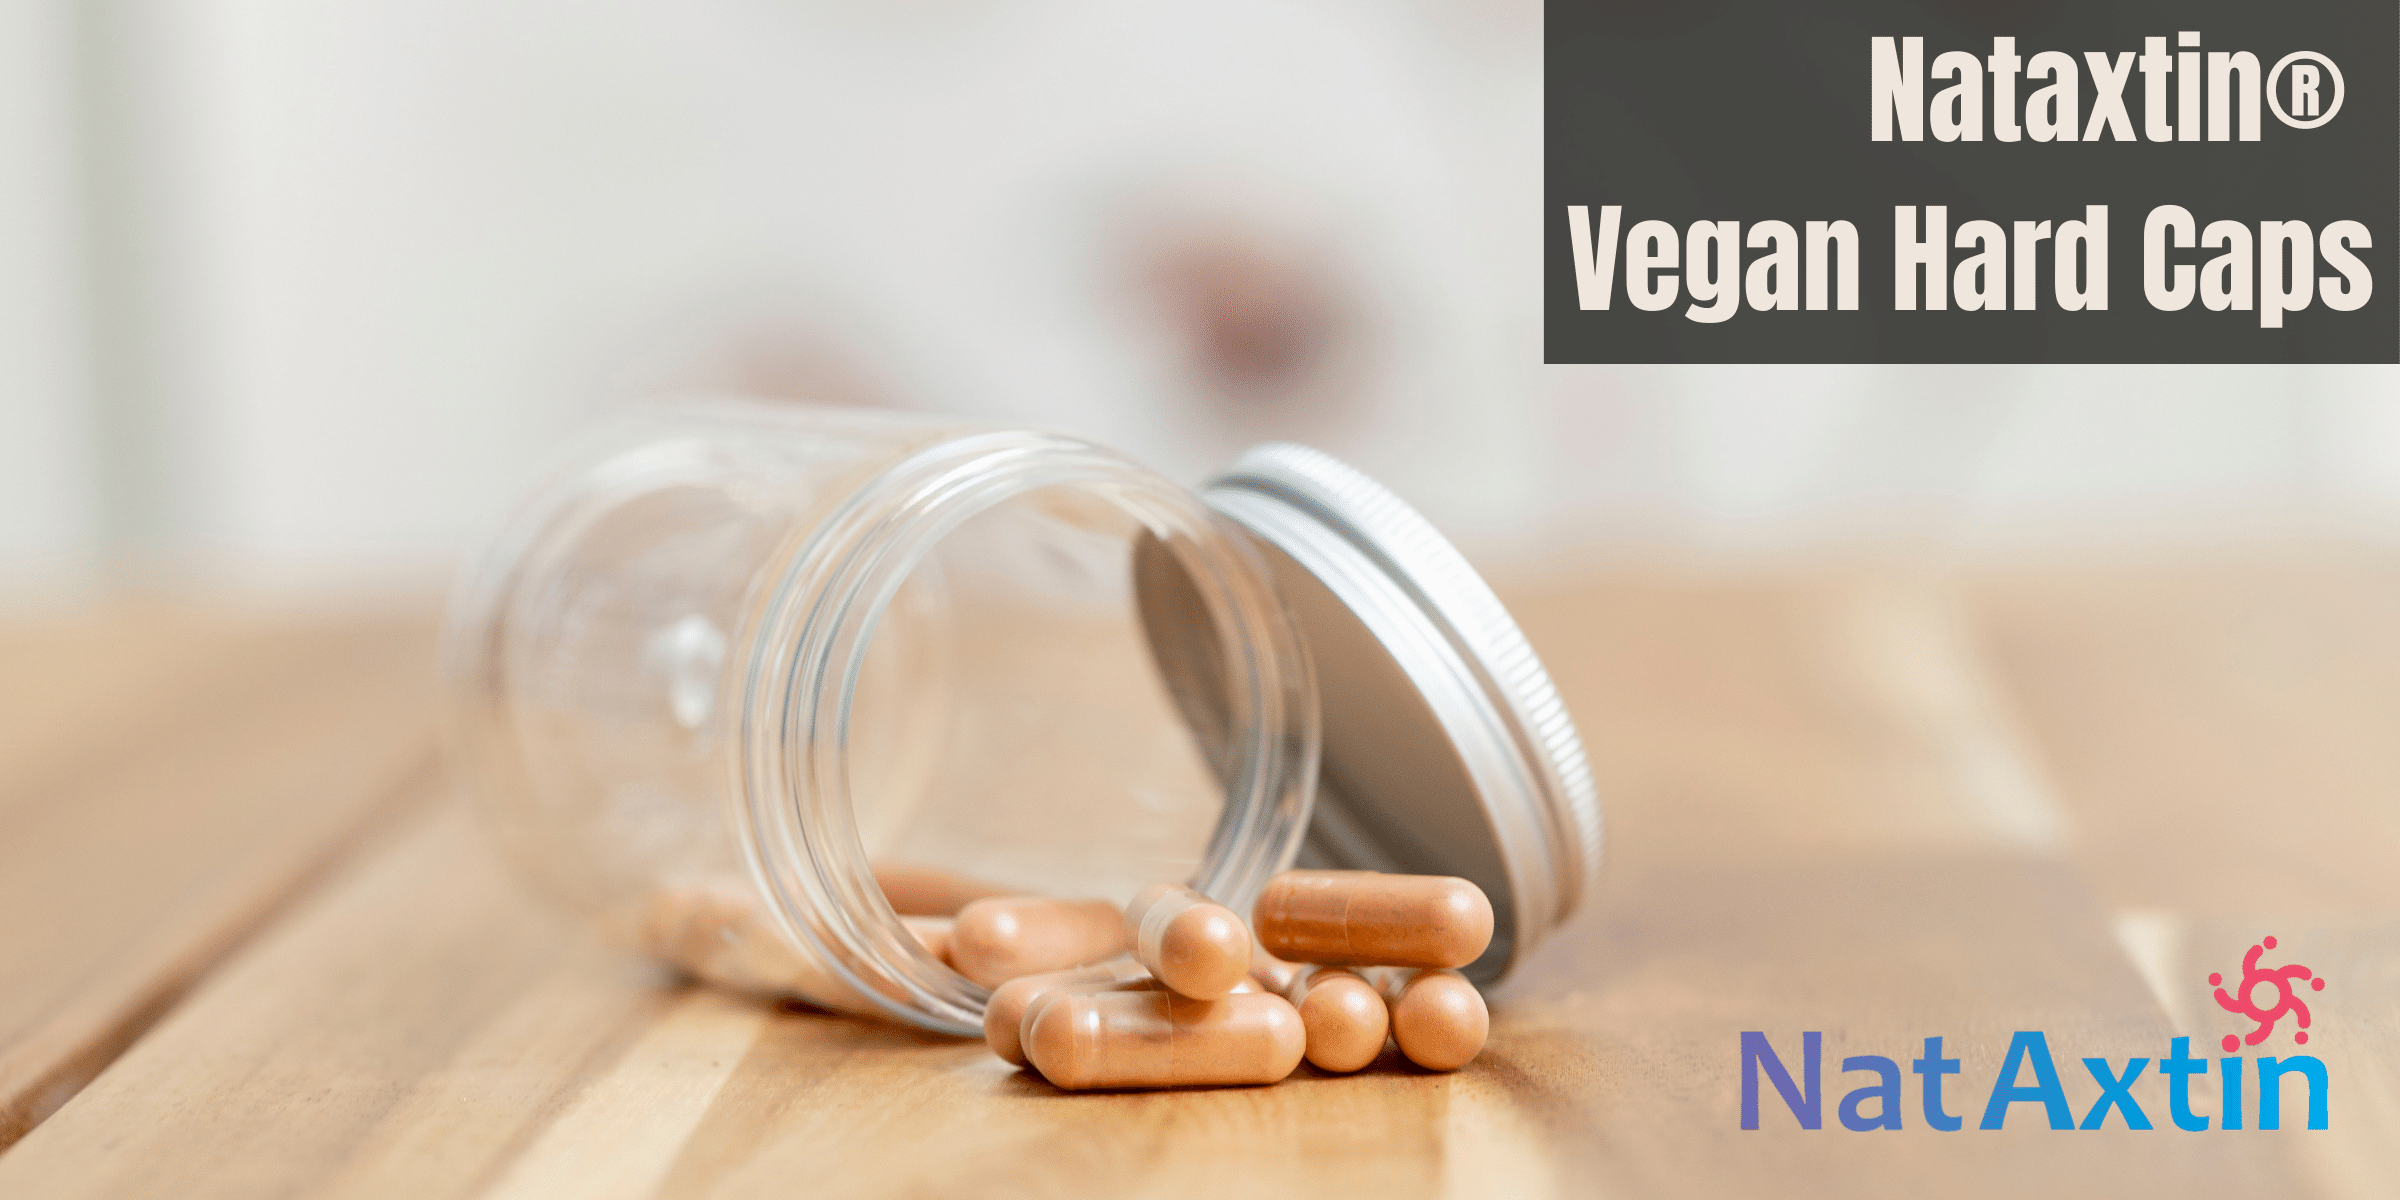 Nataxtin Vegan softgels